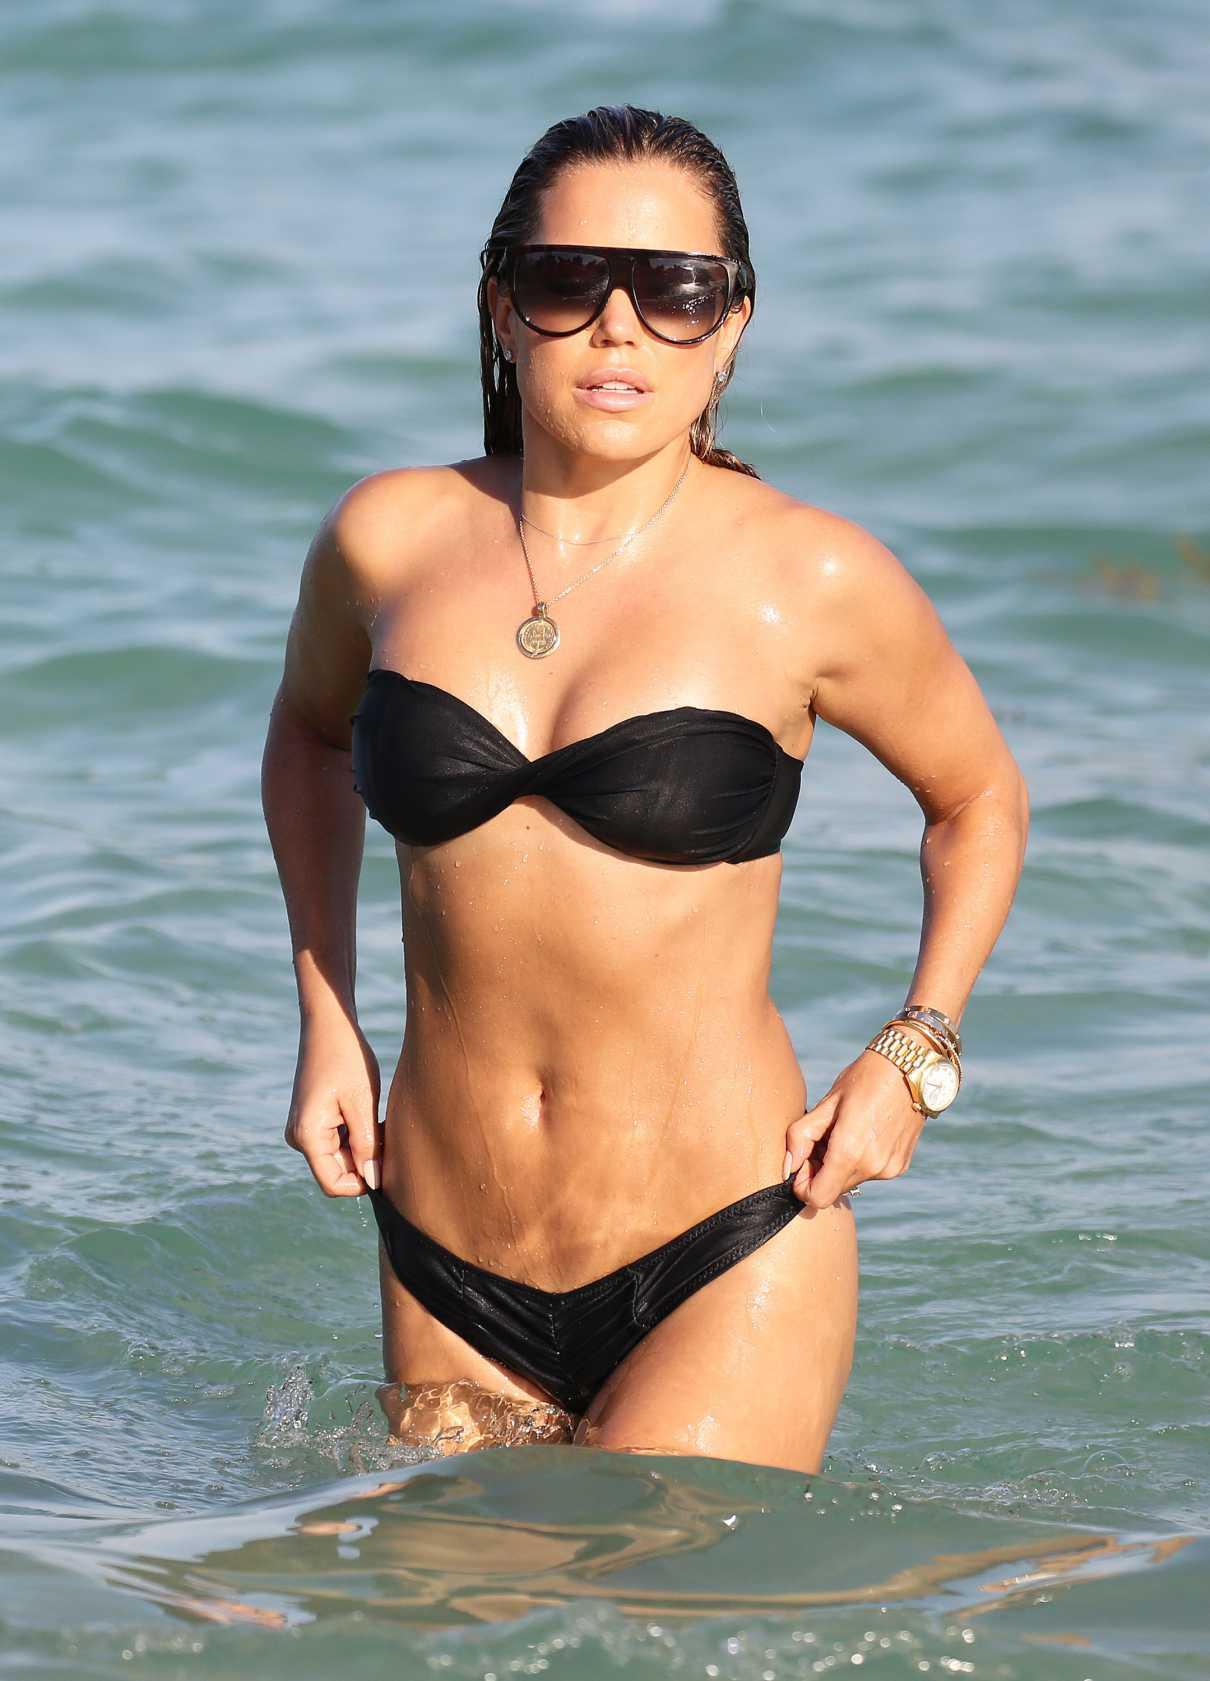 Sylvie Meis in a Black Bikini